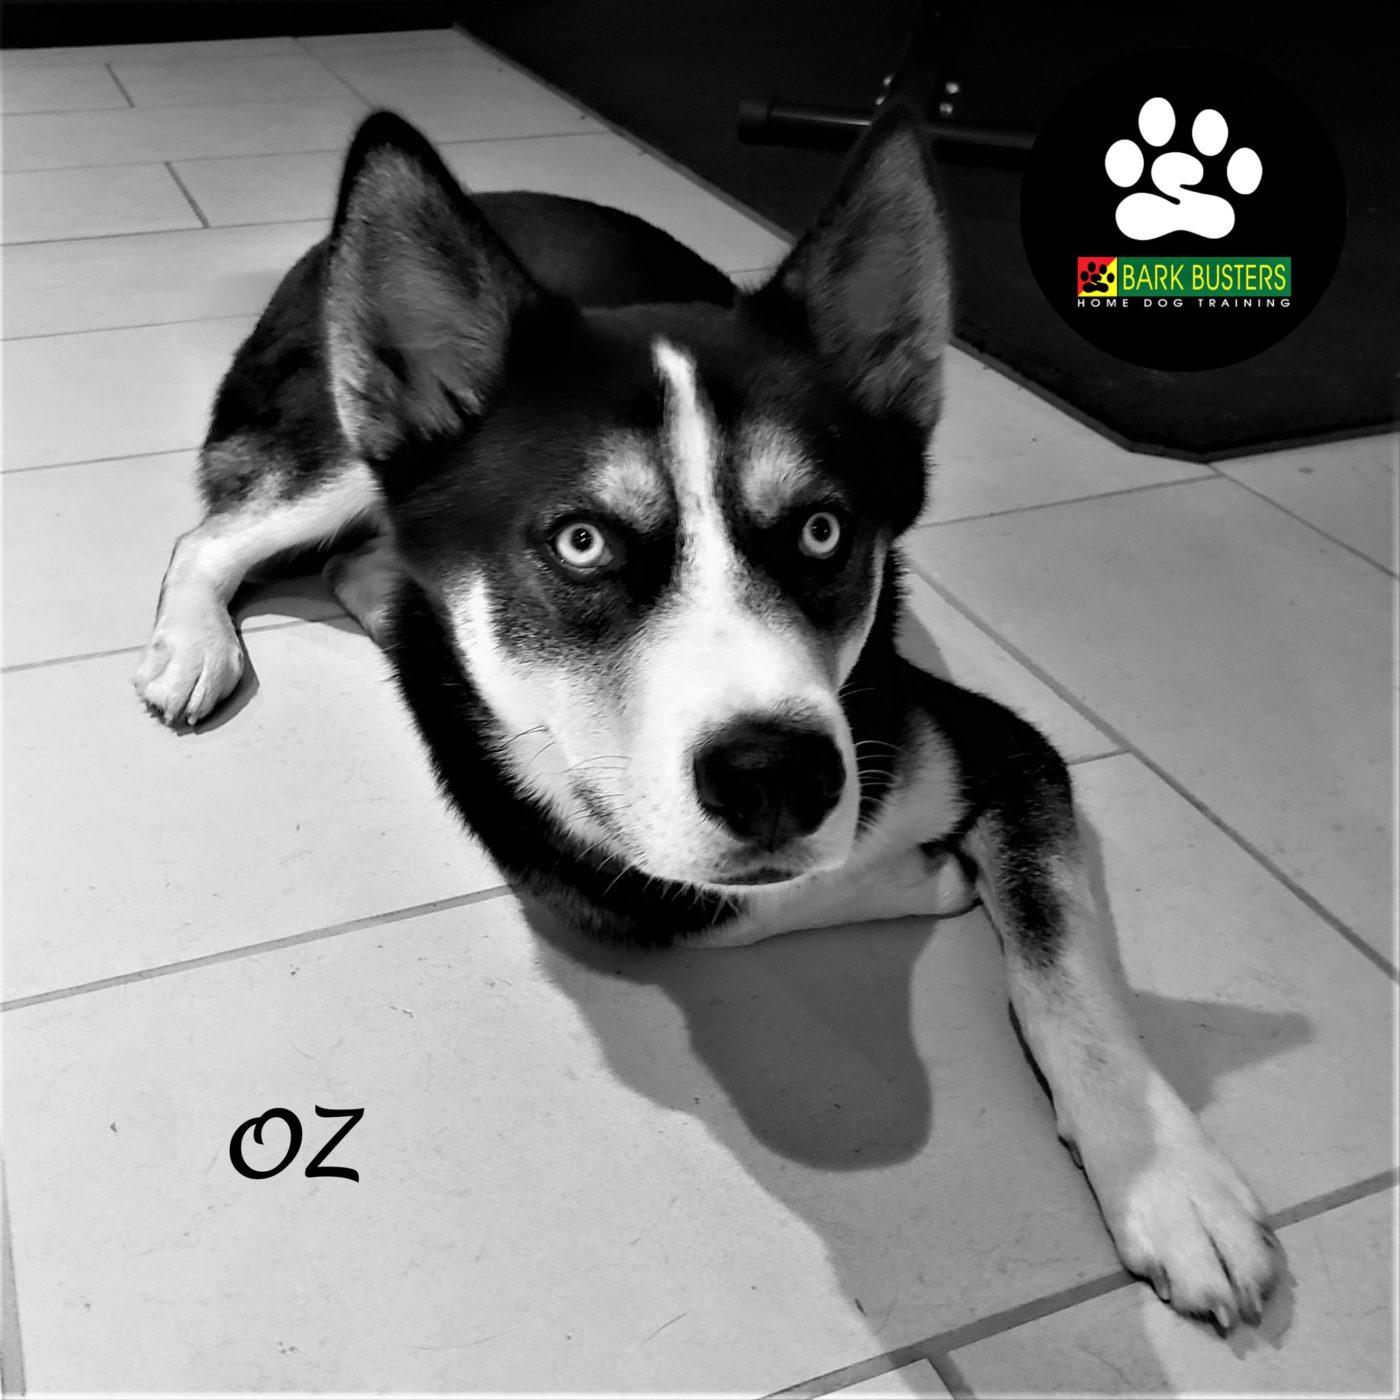 #husky #dogtrainingaustin #separationanxiety #obediencetraining #leashtraining #dogtrainernearme #abetterwaytoabetterdog #barkbusters #inhomedogtraining